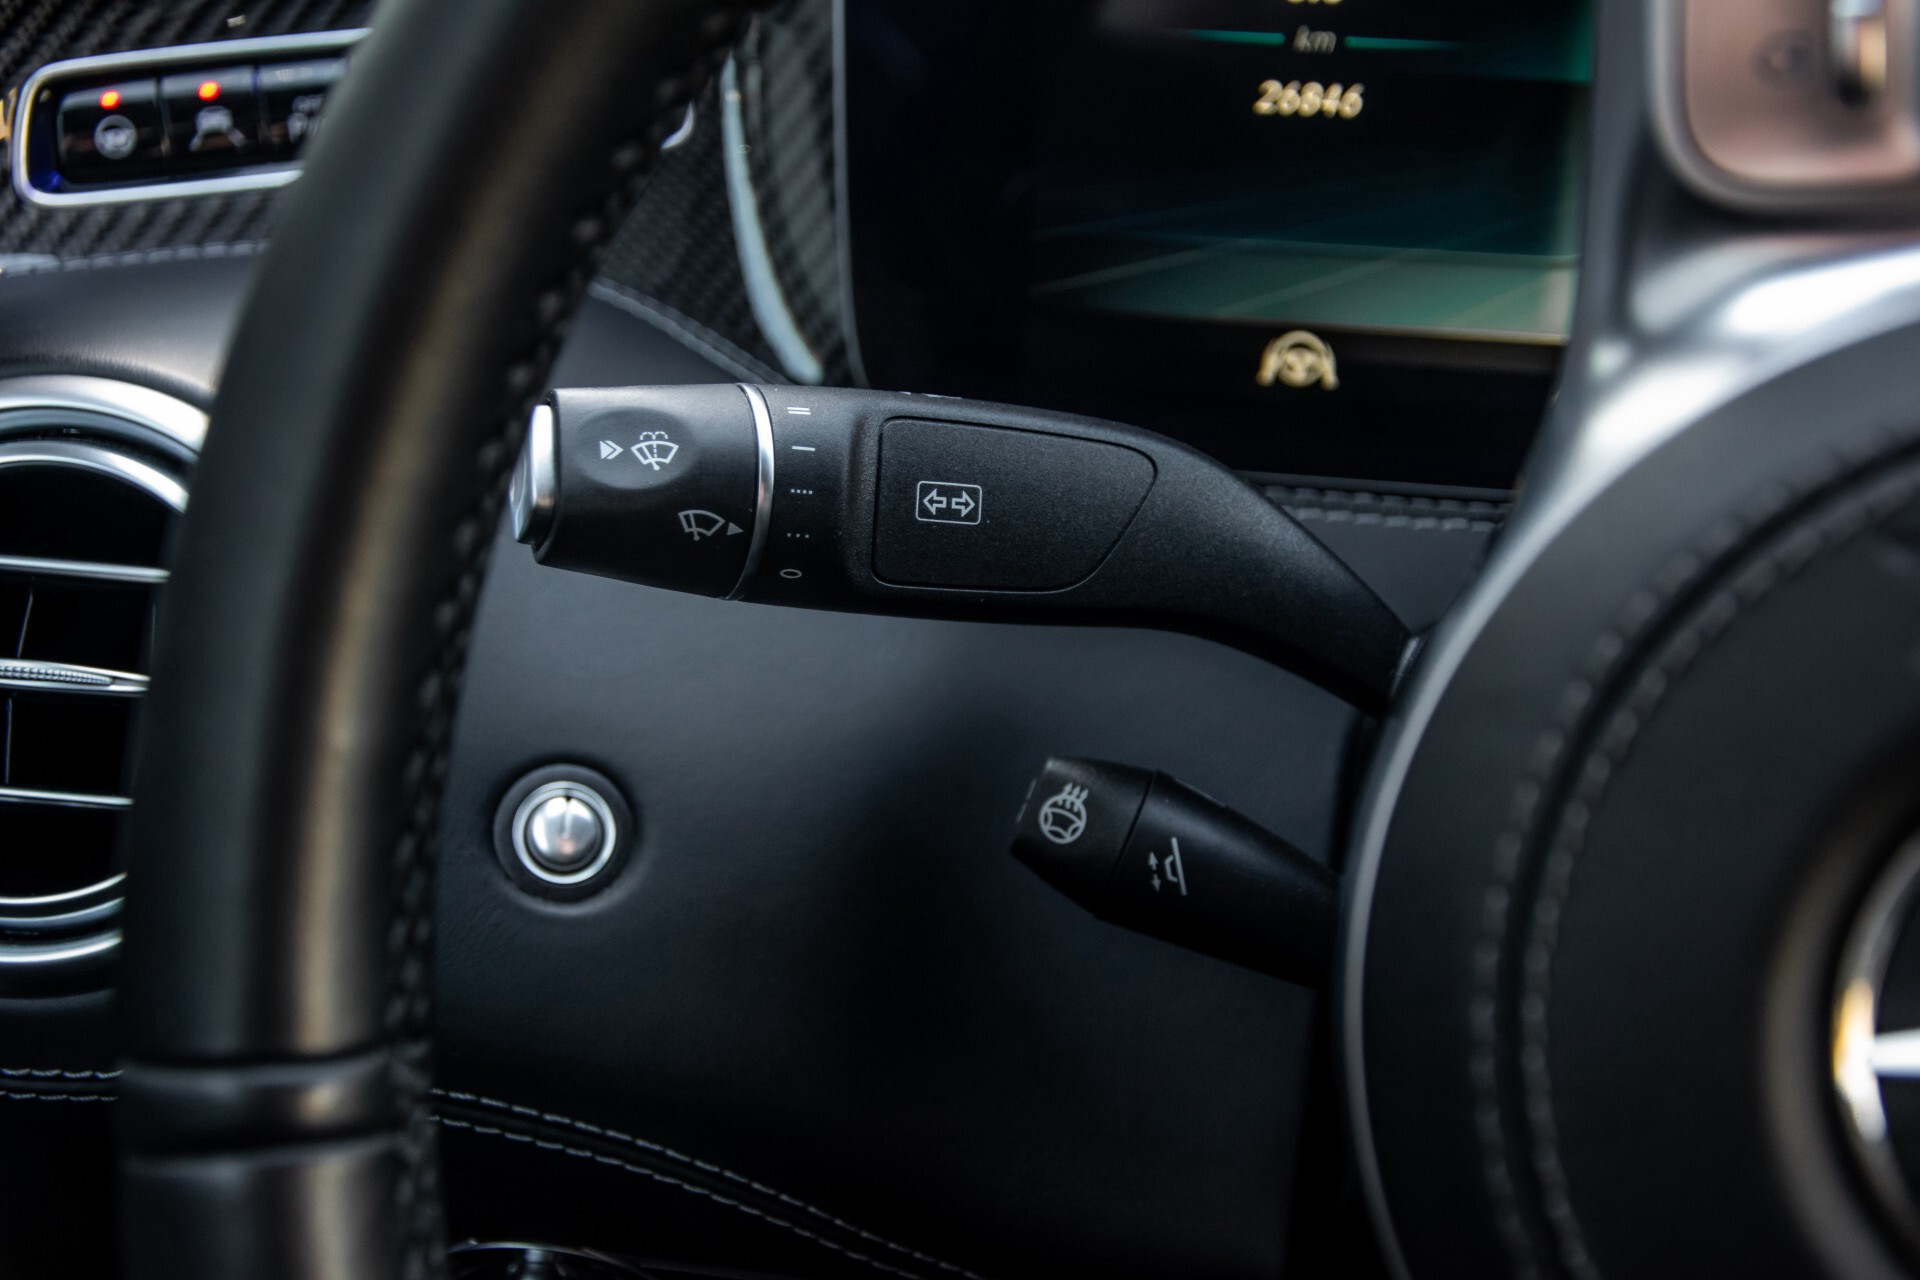 Mercedes-Benz S-Klasse Cabrio 63 AMG 4M+ Keramisch/Burmester High End 3D/Carbon/Driverspack/Blackpack Aut9 Foto 11